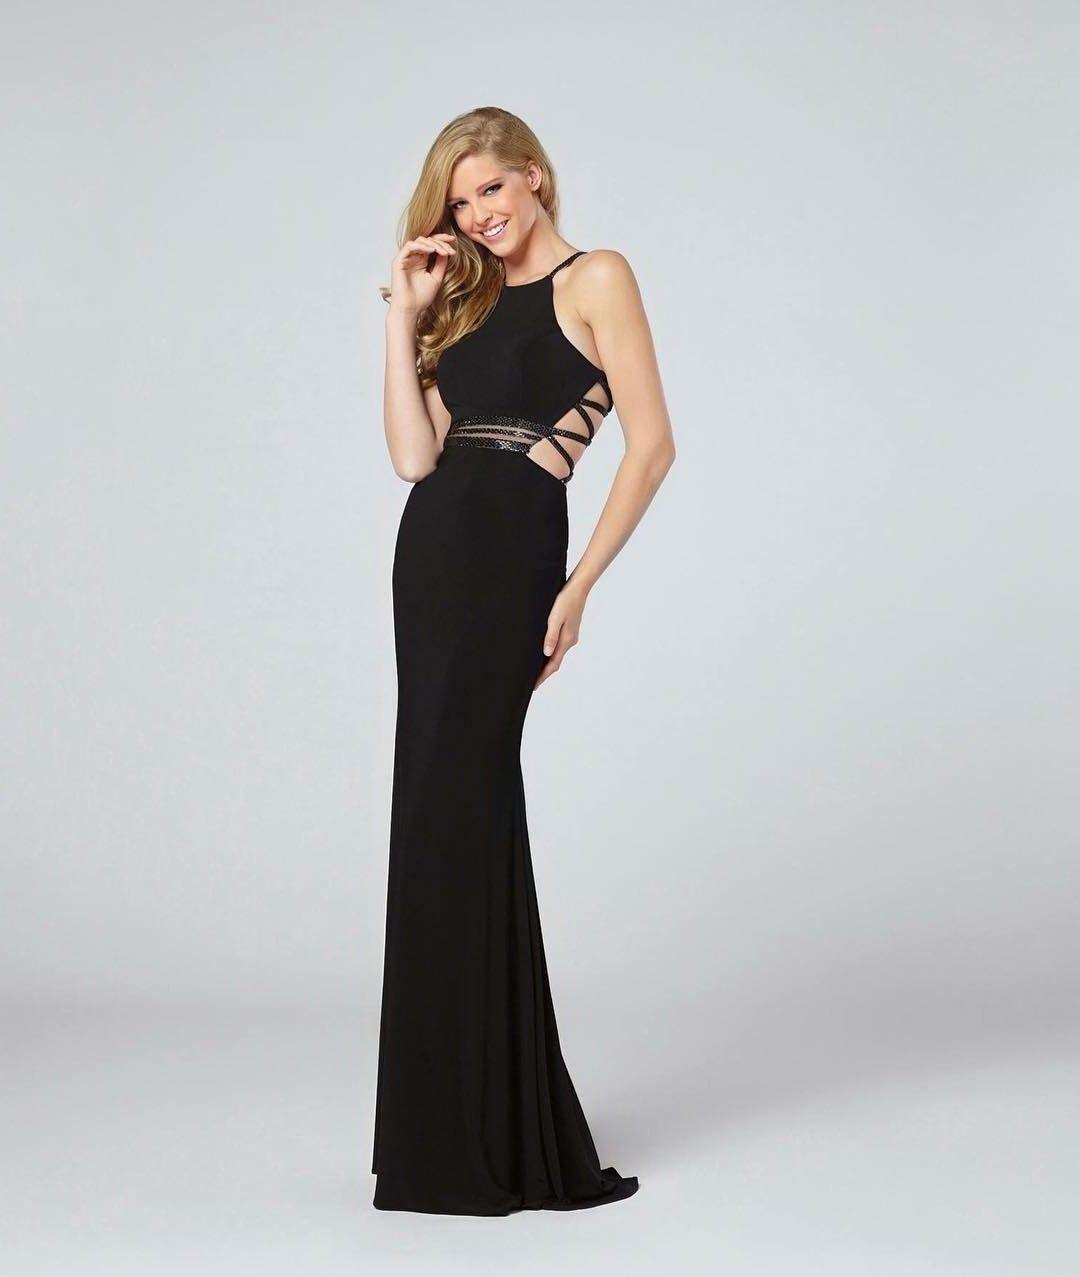 0ba33f081 Best Formal Dress For Short Hair - raveitsafe